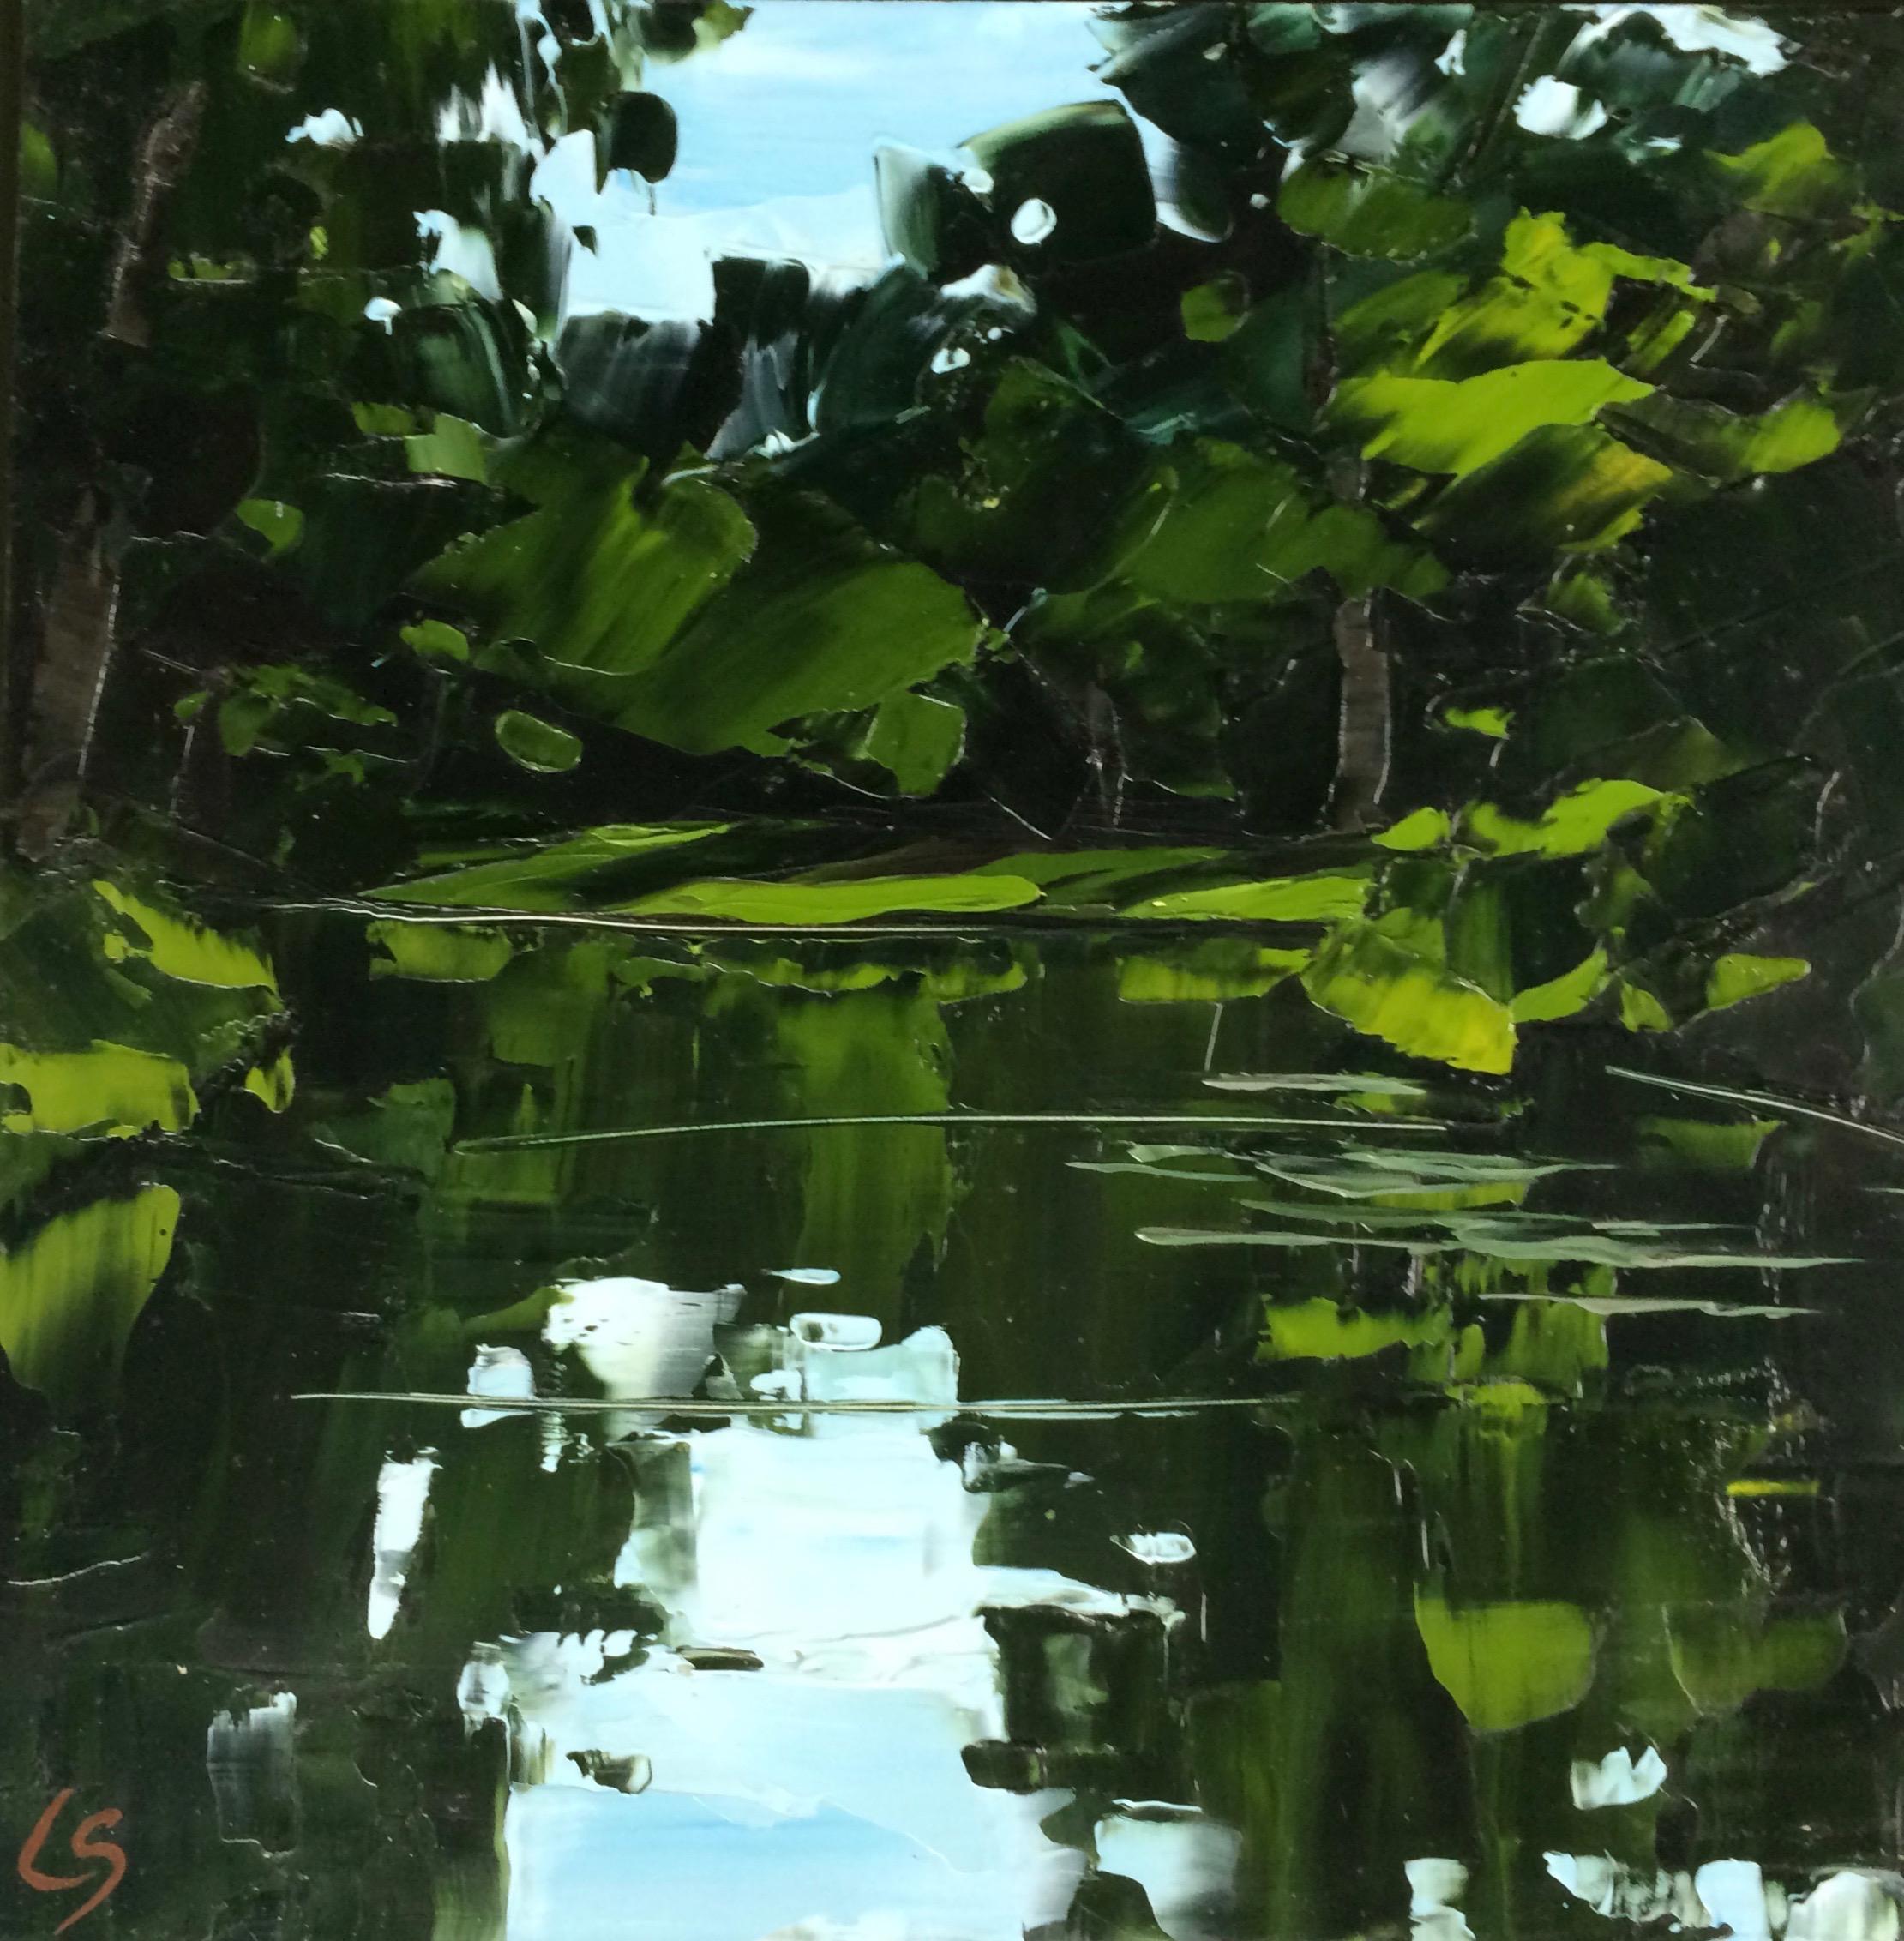 Lesley Skeates, Lesley Skeates - Waterside, oil paint applied with palette knife on panel, 30.5x30.5x0.4cm,  http://www.lesleyskeatesgallery.com